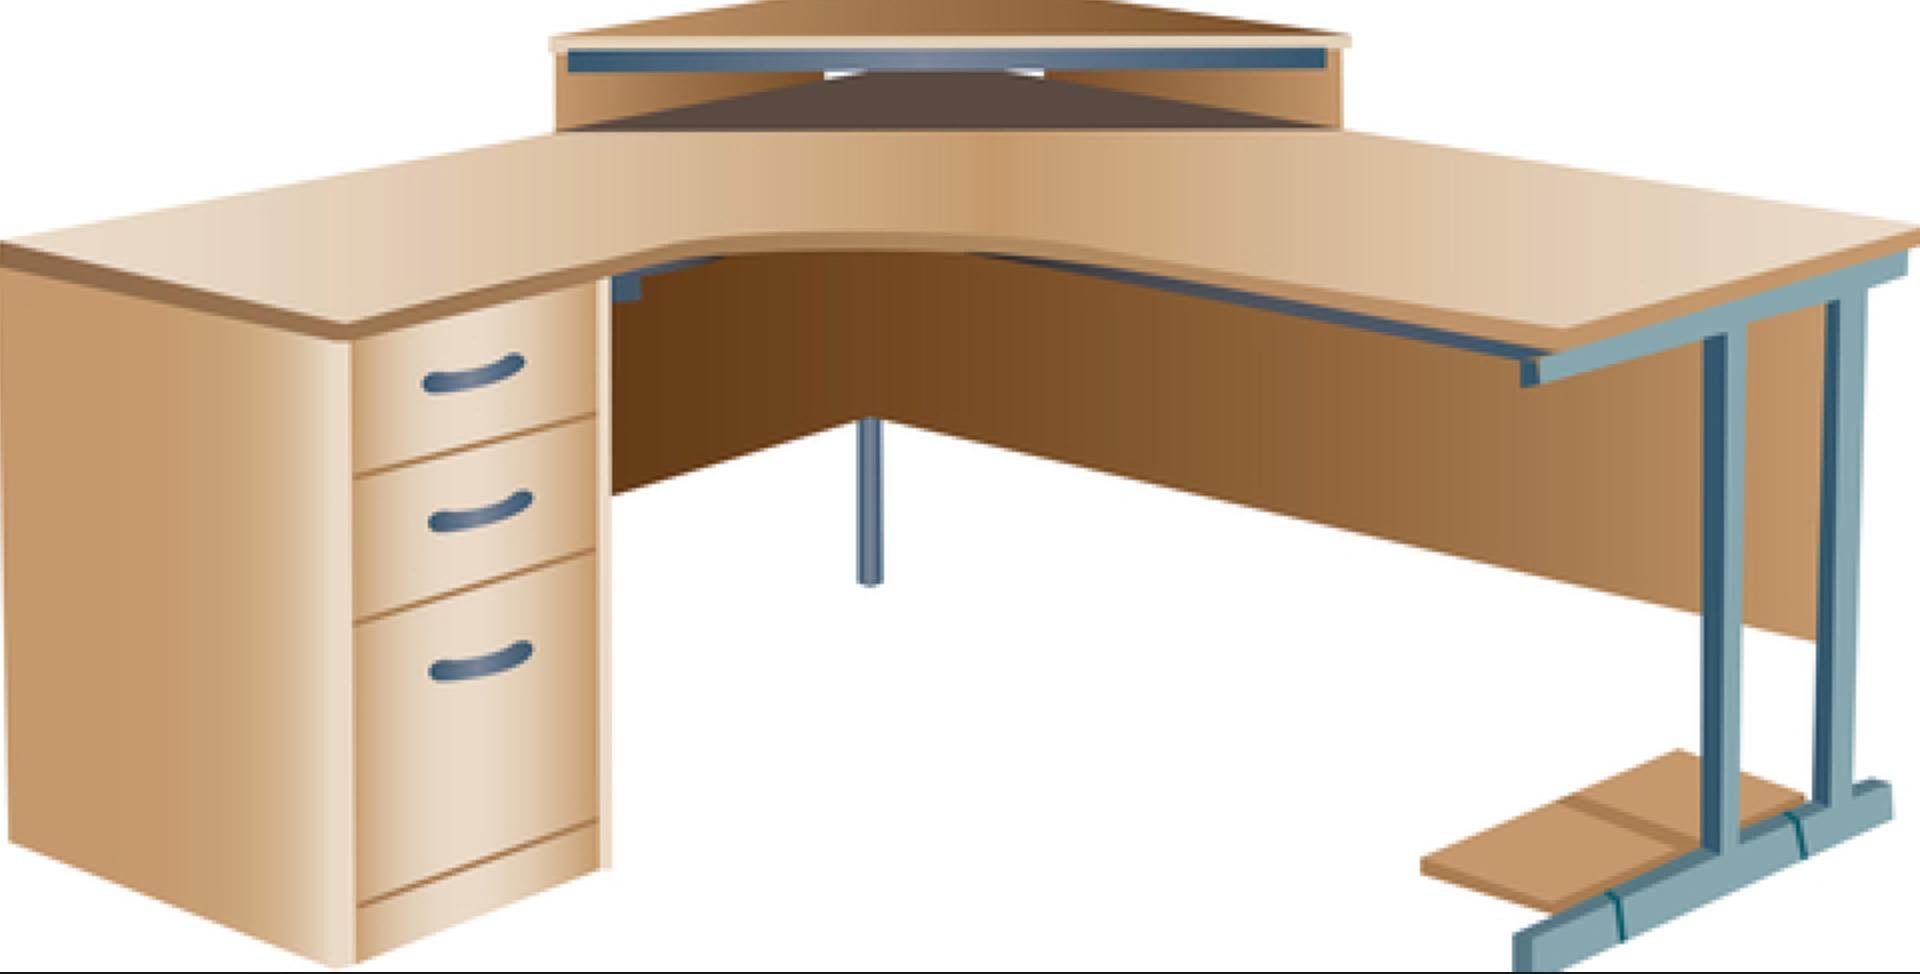 L Shaped Desks Don T Pose A Big Feng Shui Problem Although They